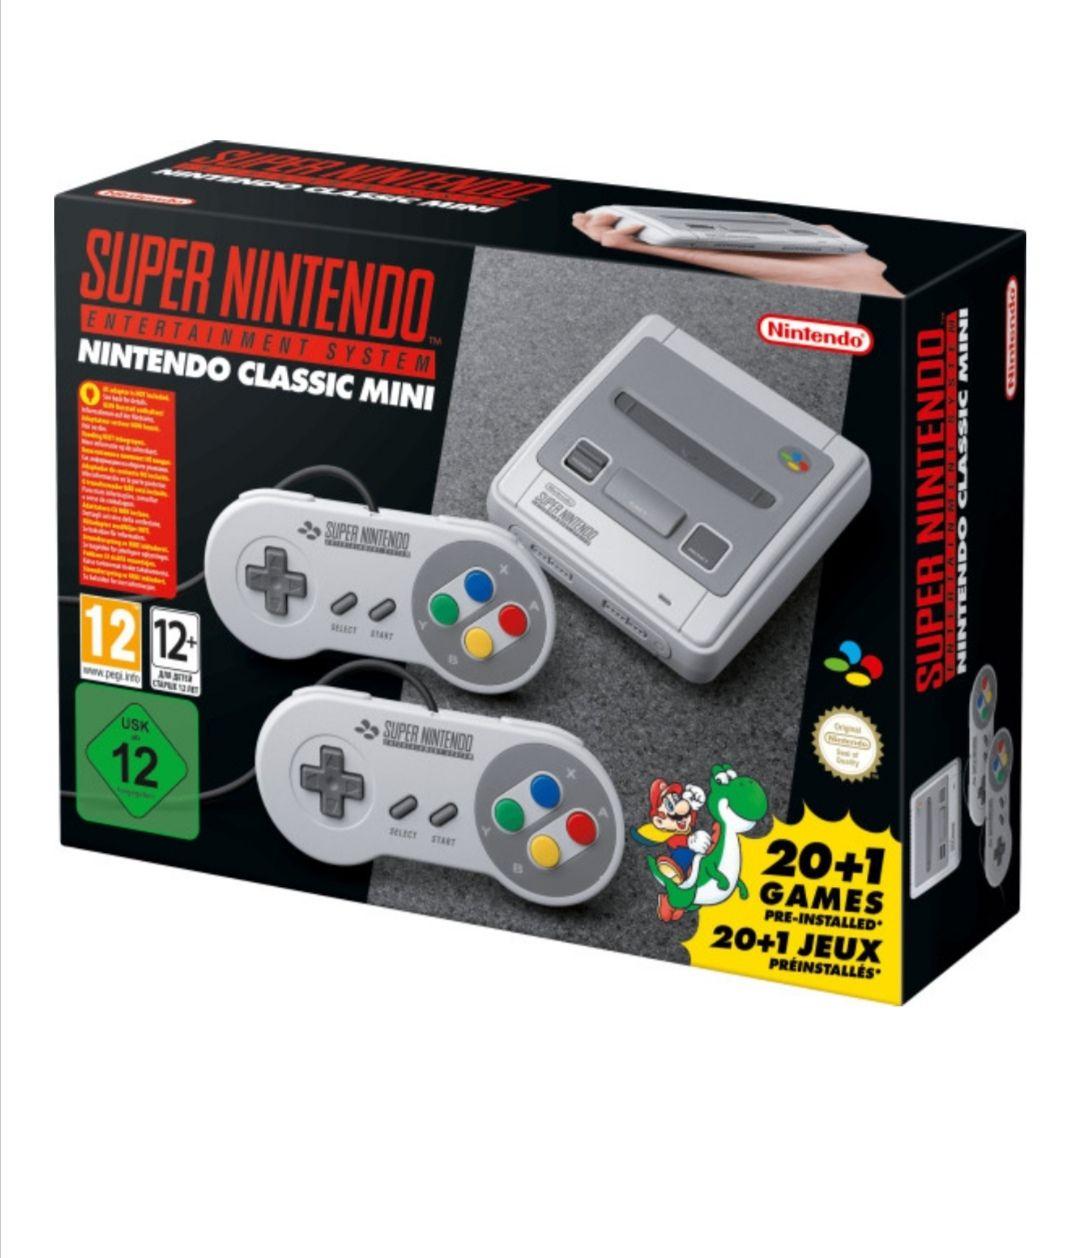 [Bücher.de] Super Nintendo Classic Mini für 79,99€